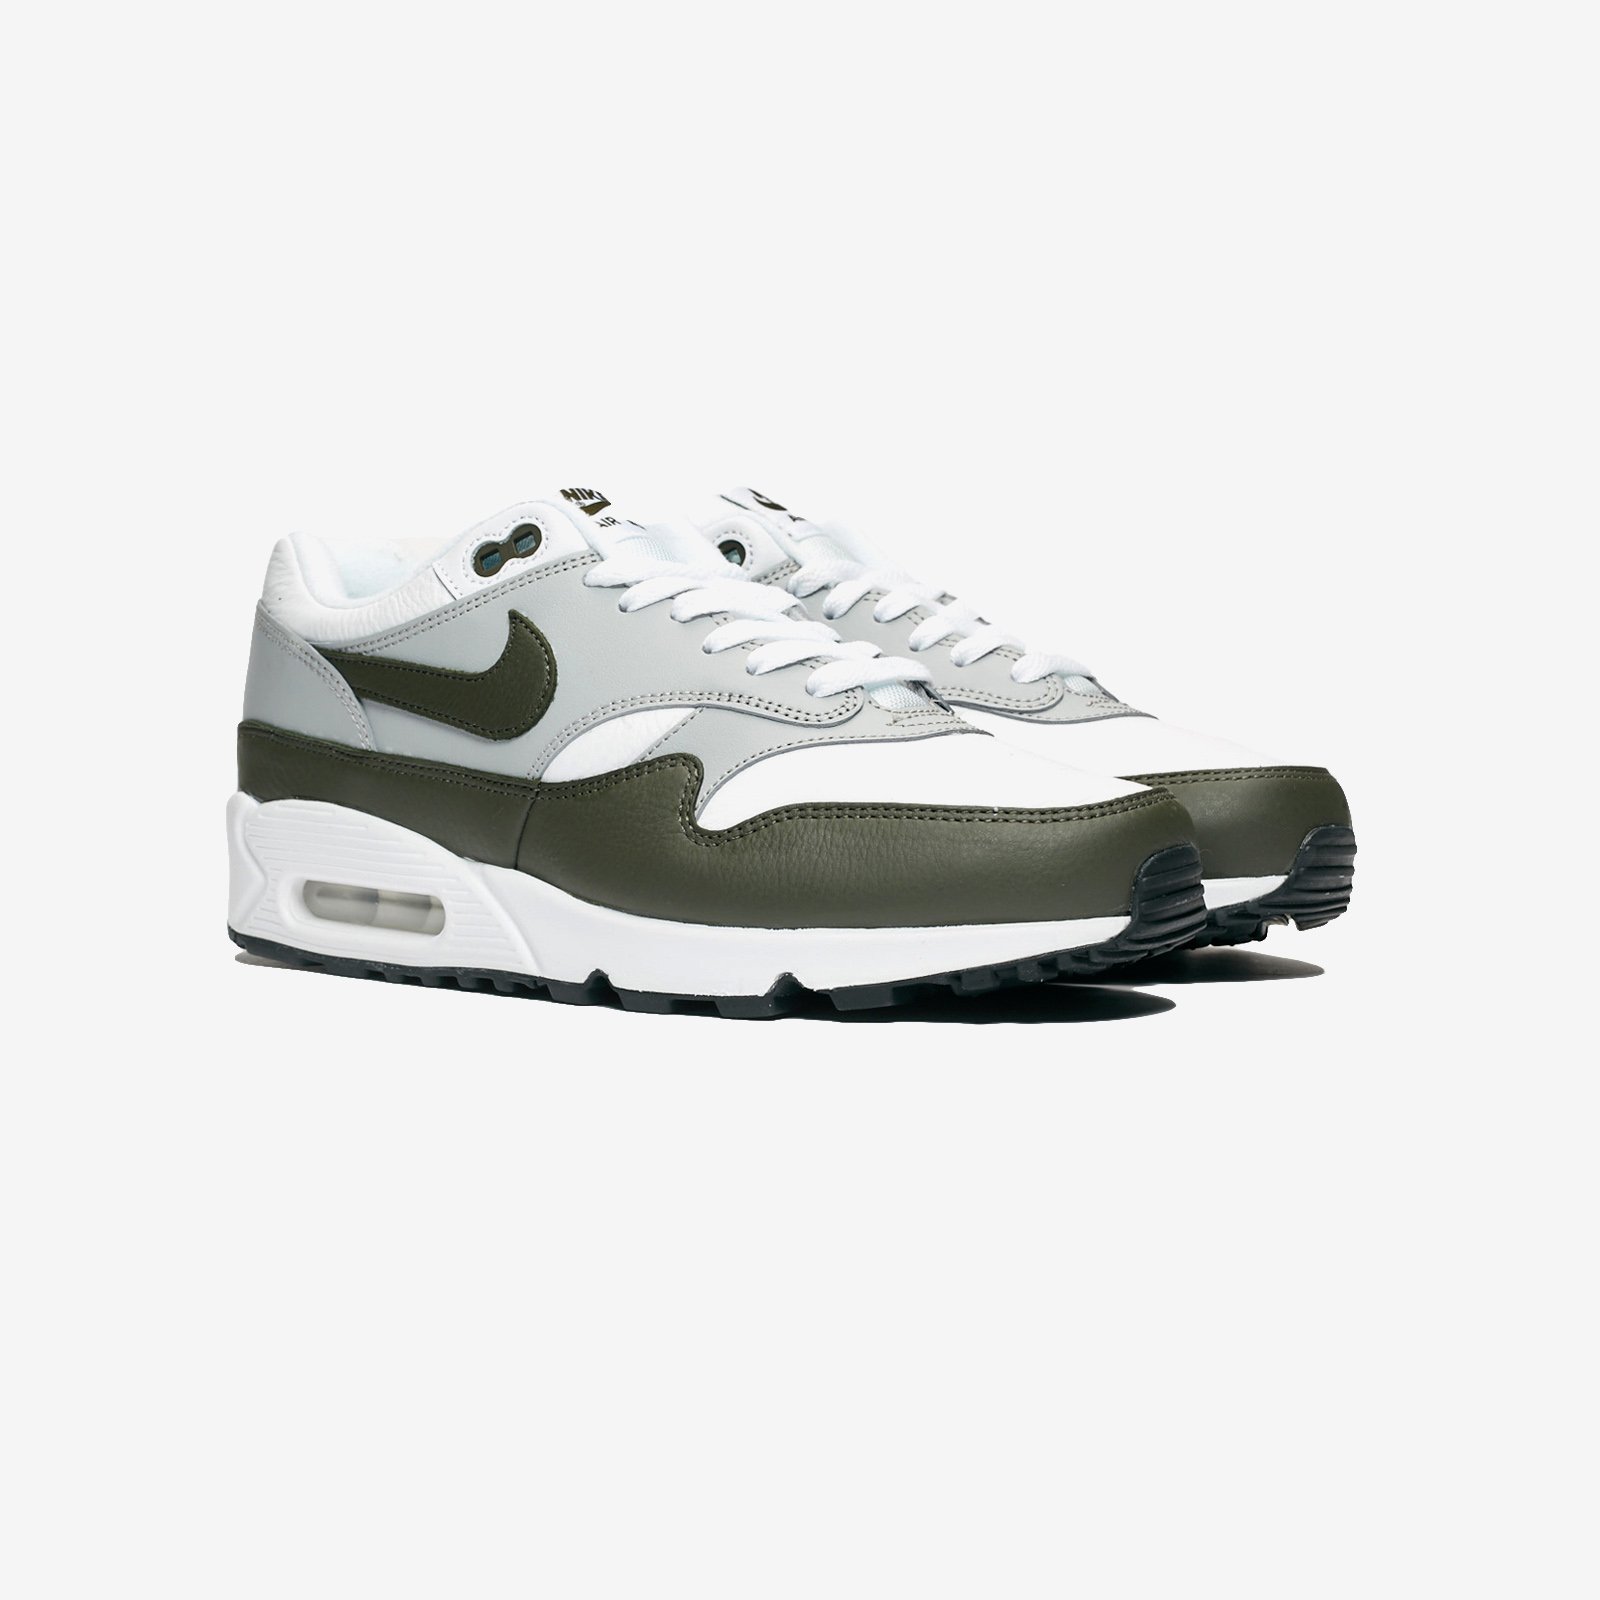 cdf1a0c29b1f Nike Air Max 90 1 - Aj7695-107 - Sneakersnstuff